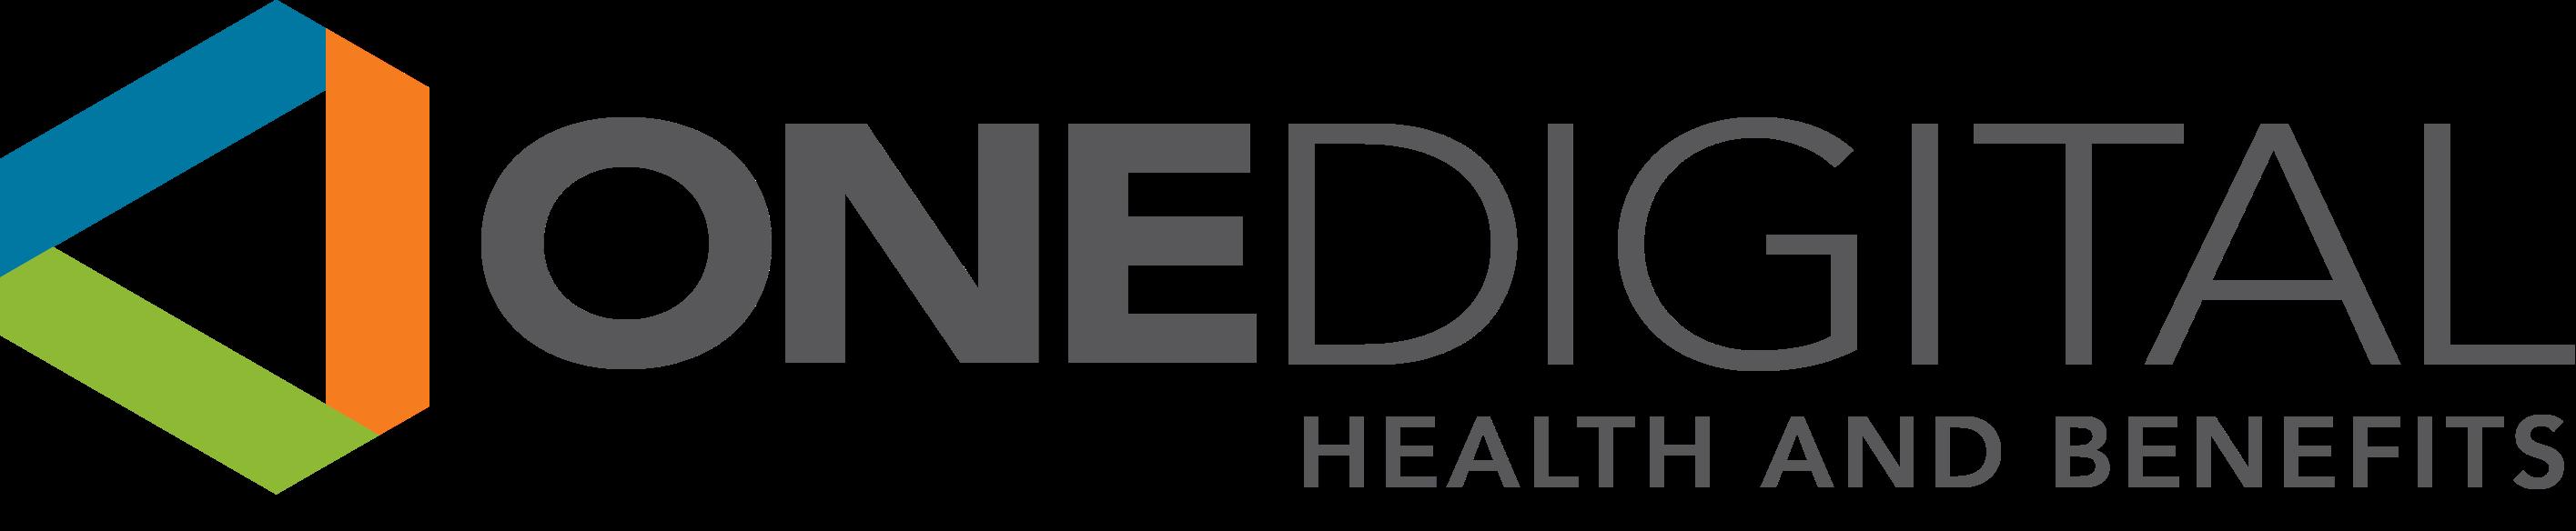 OneDigital Health and Benefits  Company Logo